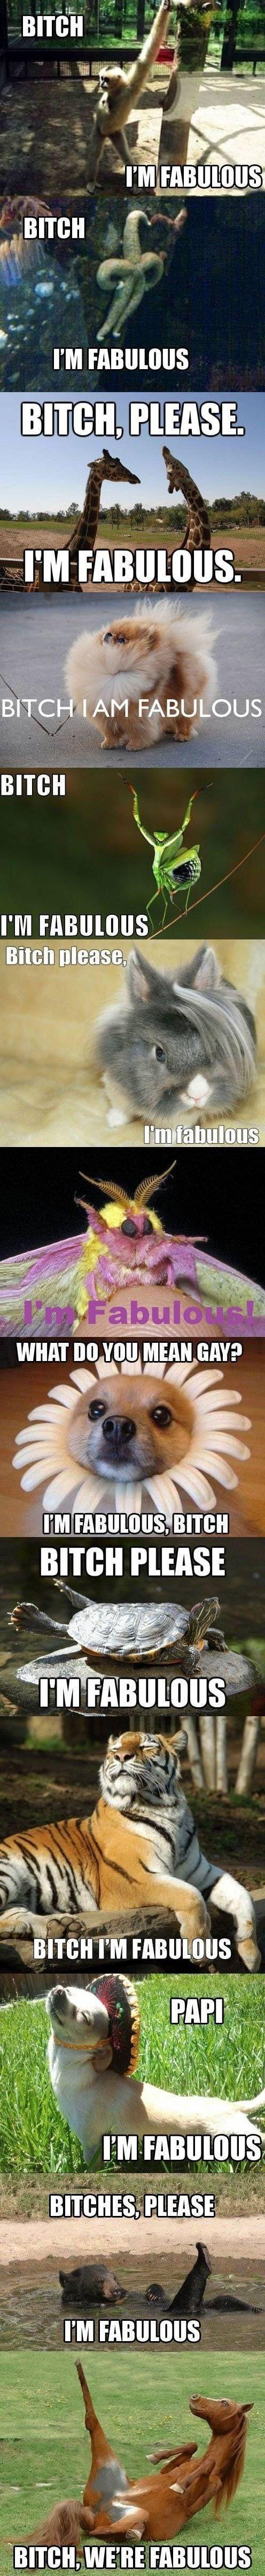 I'm fabulous animal edition